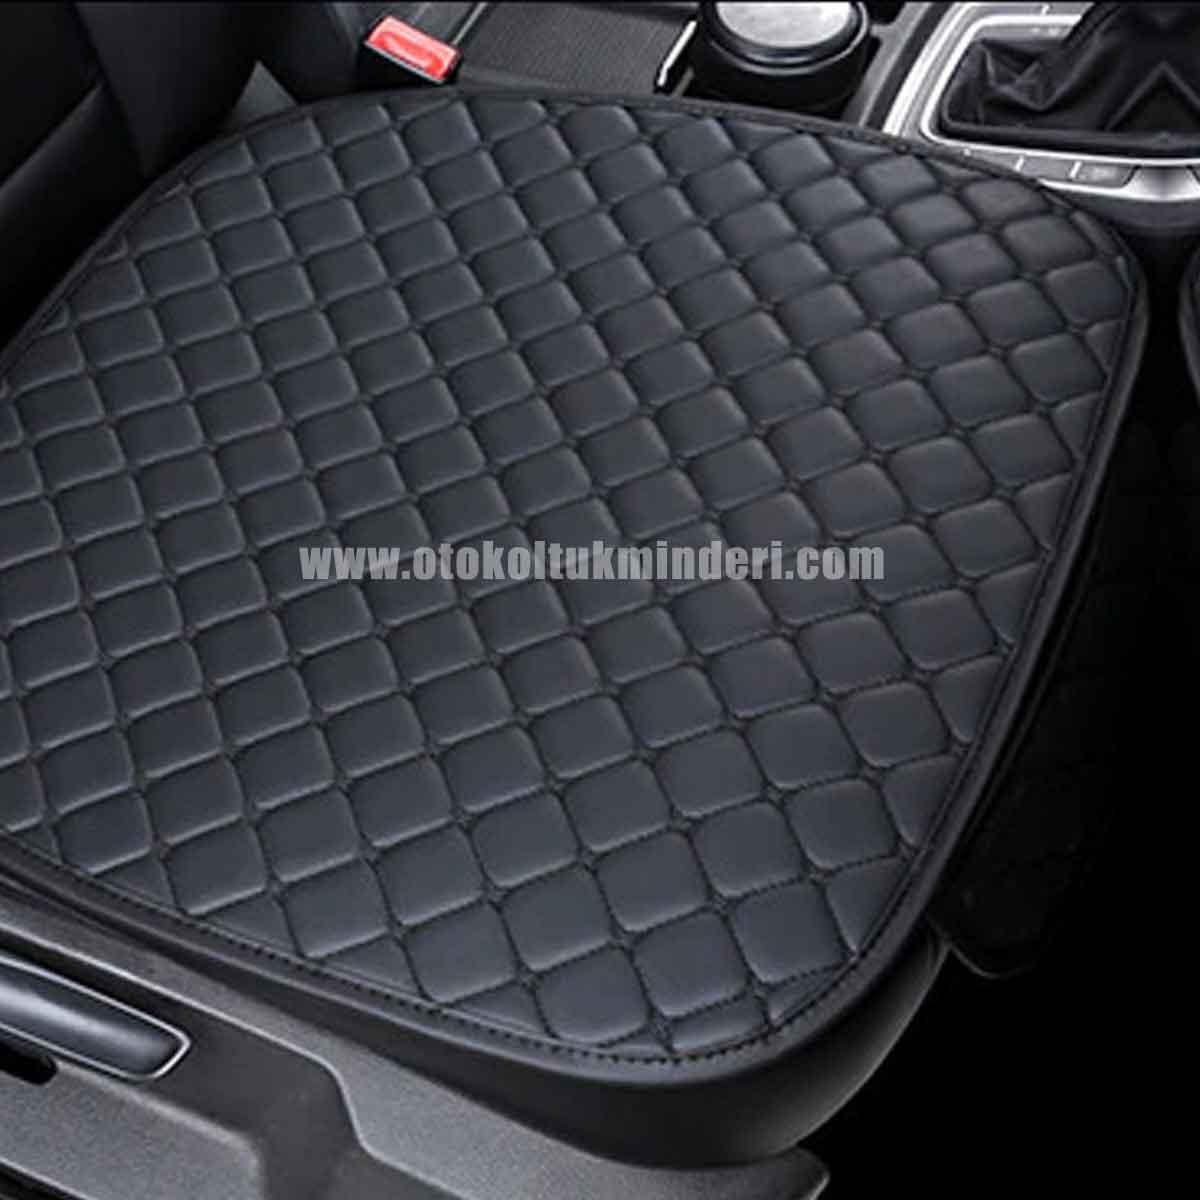 Chevrolet oto koltuk kılıfı - Chevrolet Koltuk minderi Siyah Deri Cepli